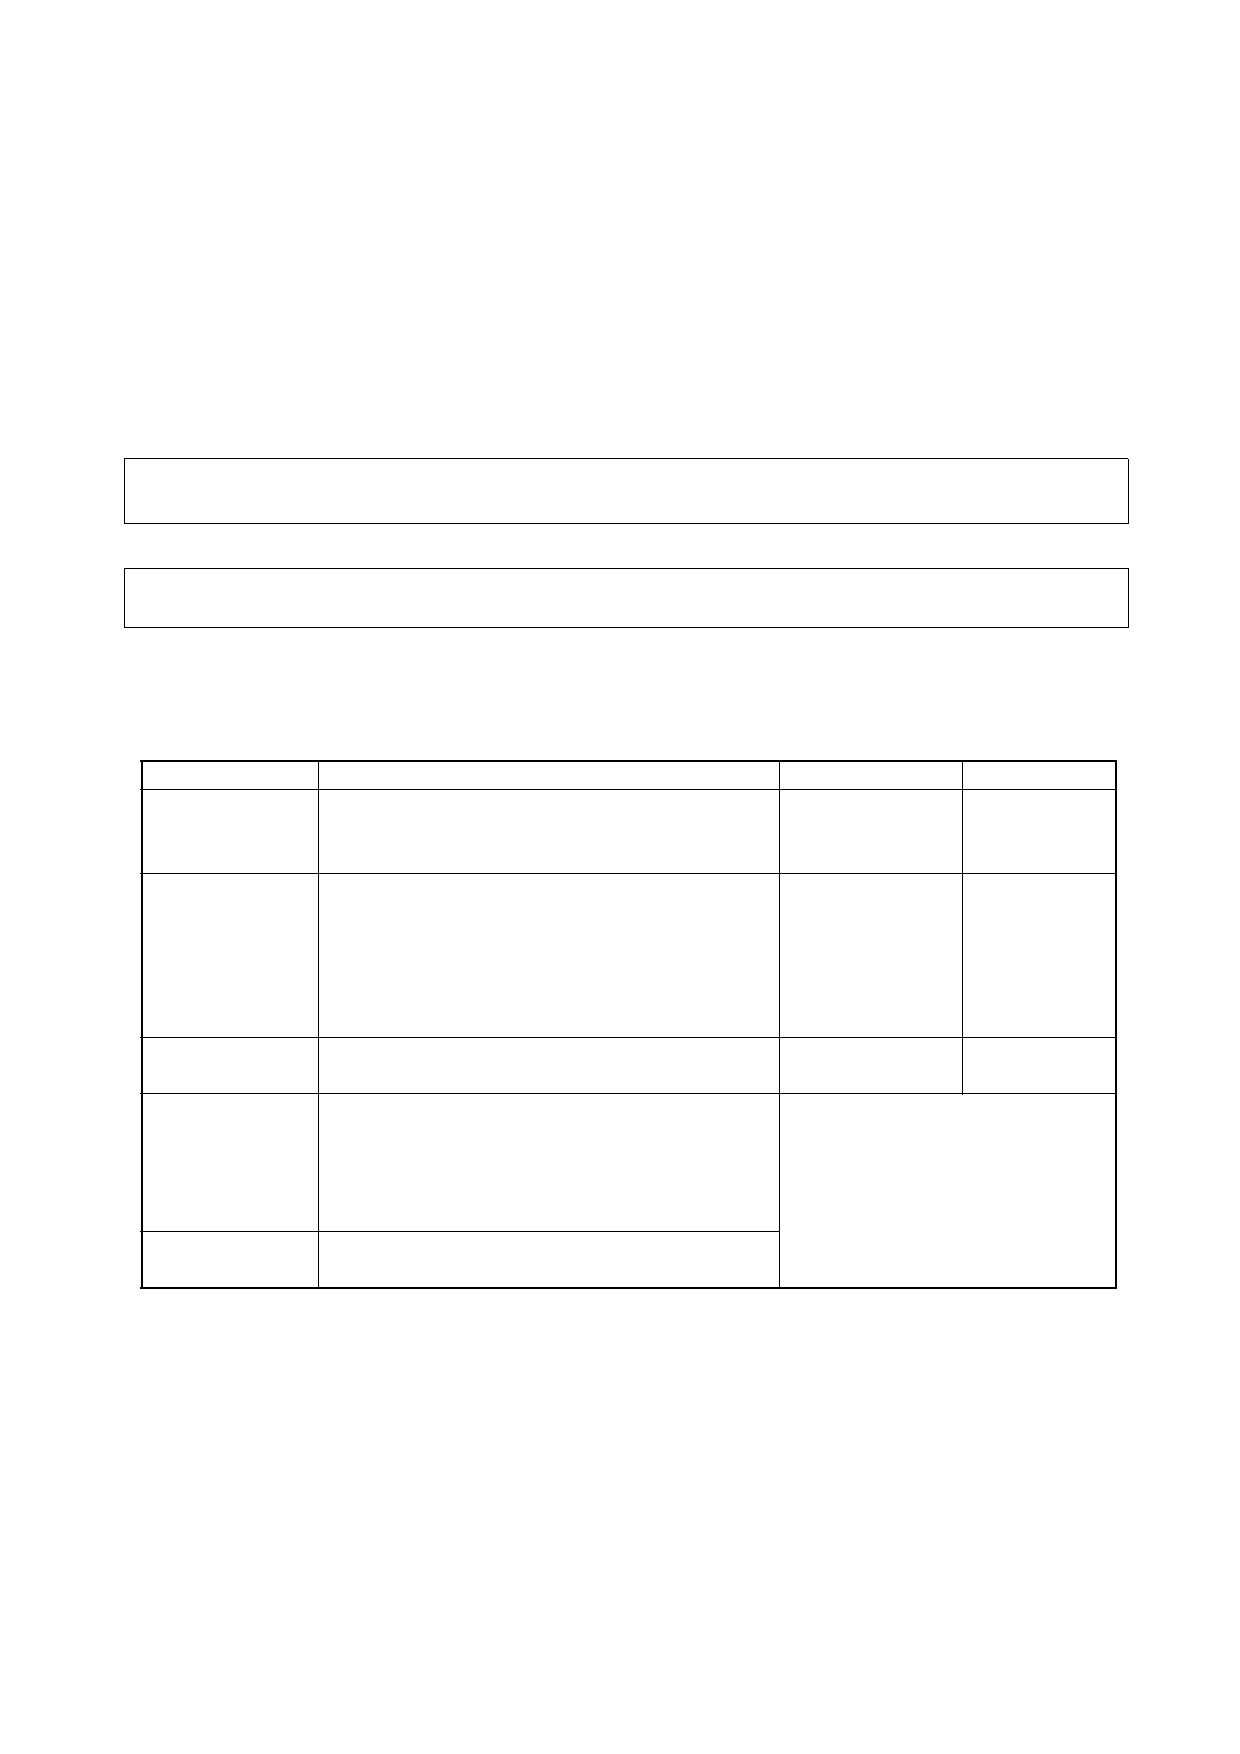 R5F2121CJFP pdf, 반도체, 판매, 대치품